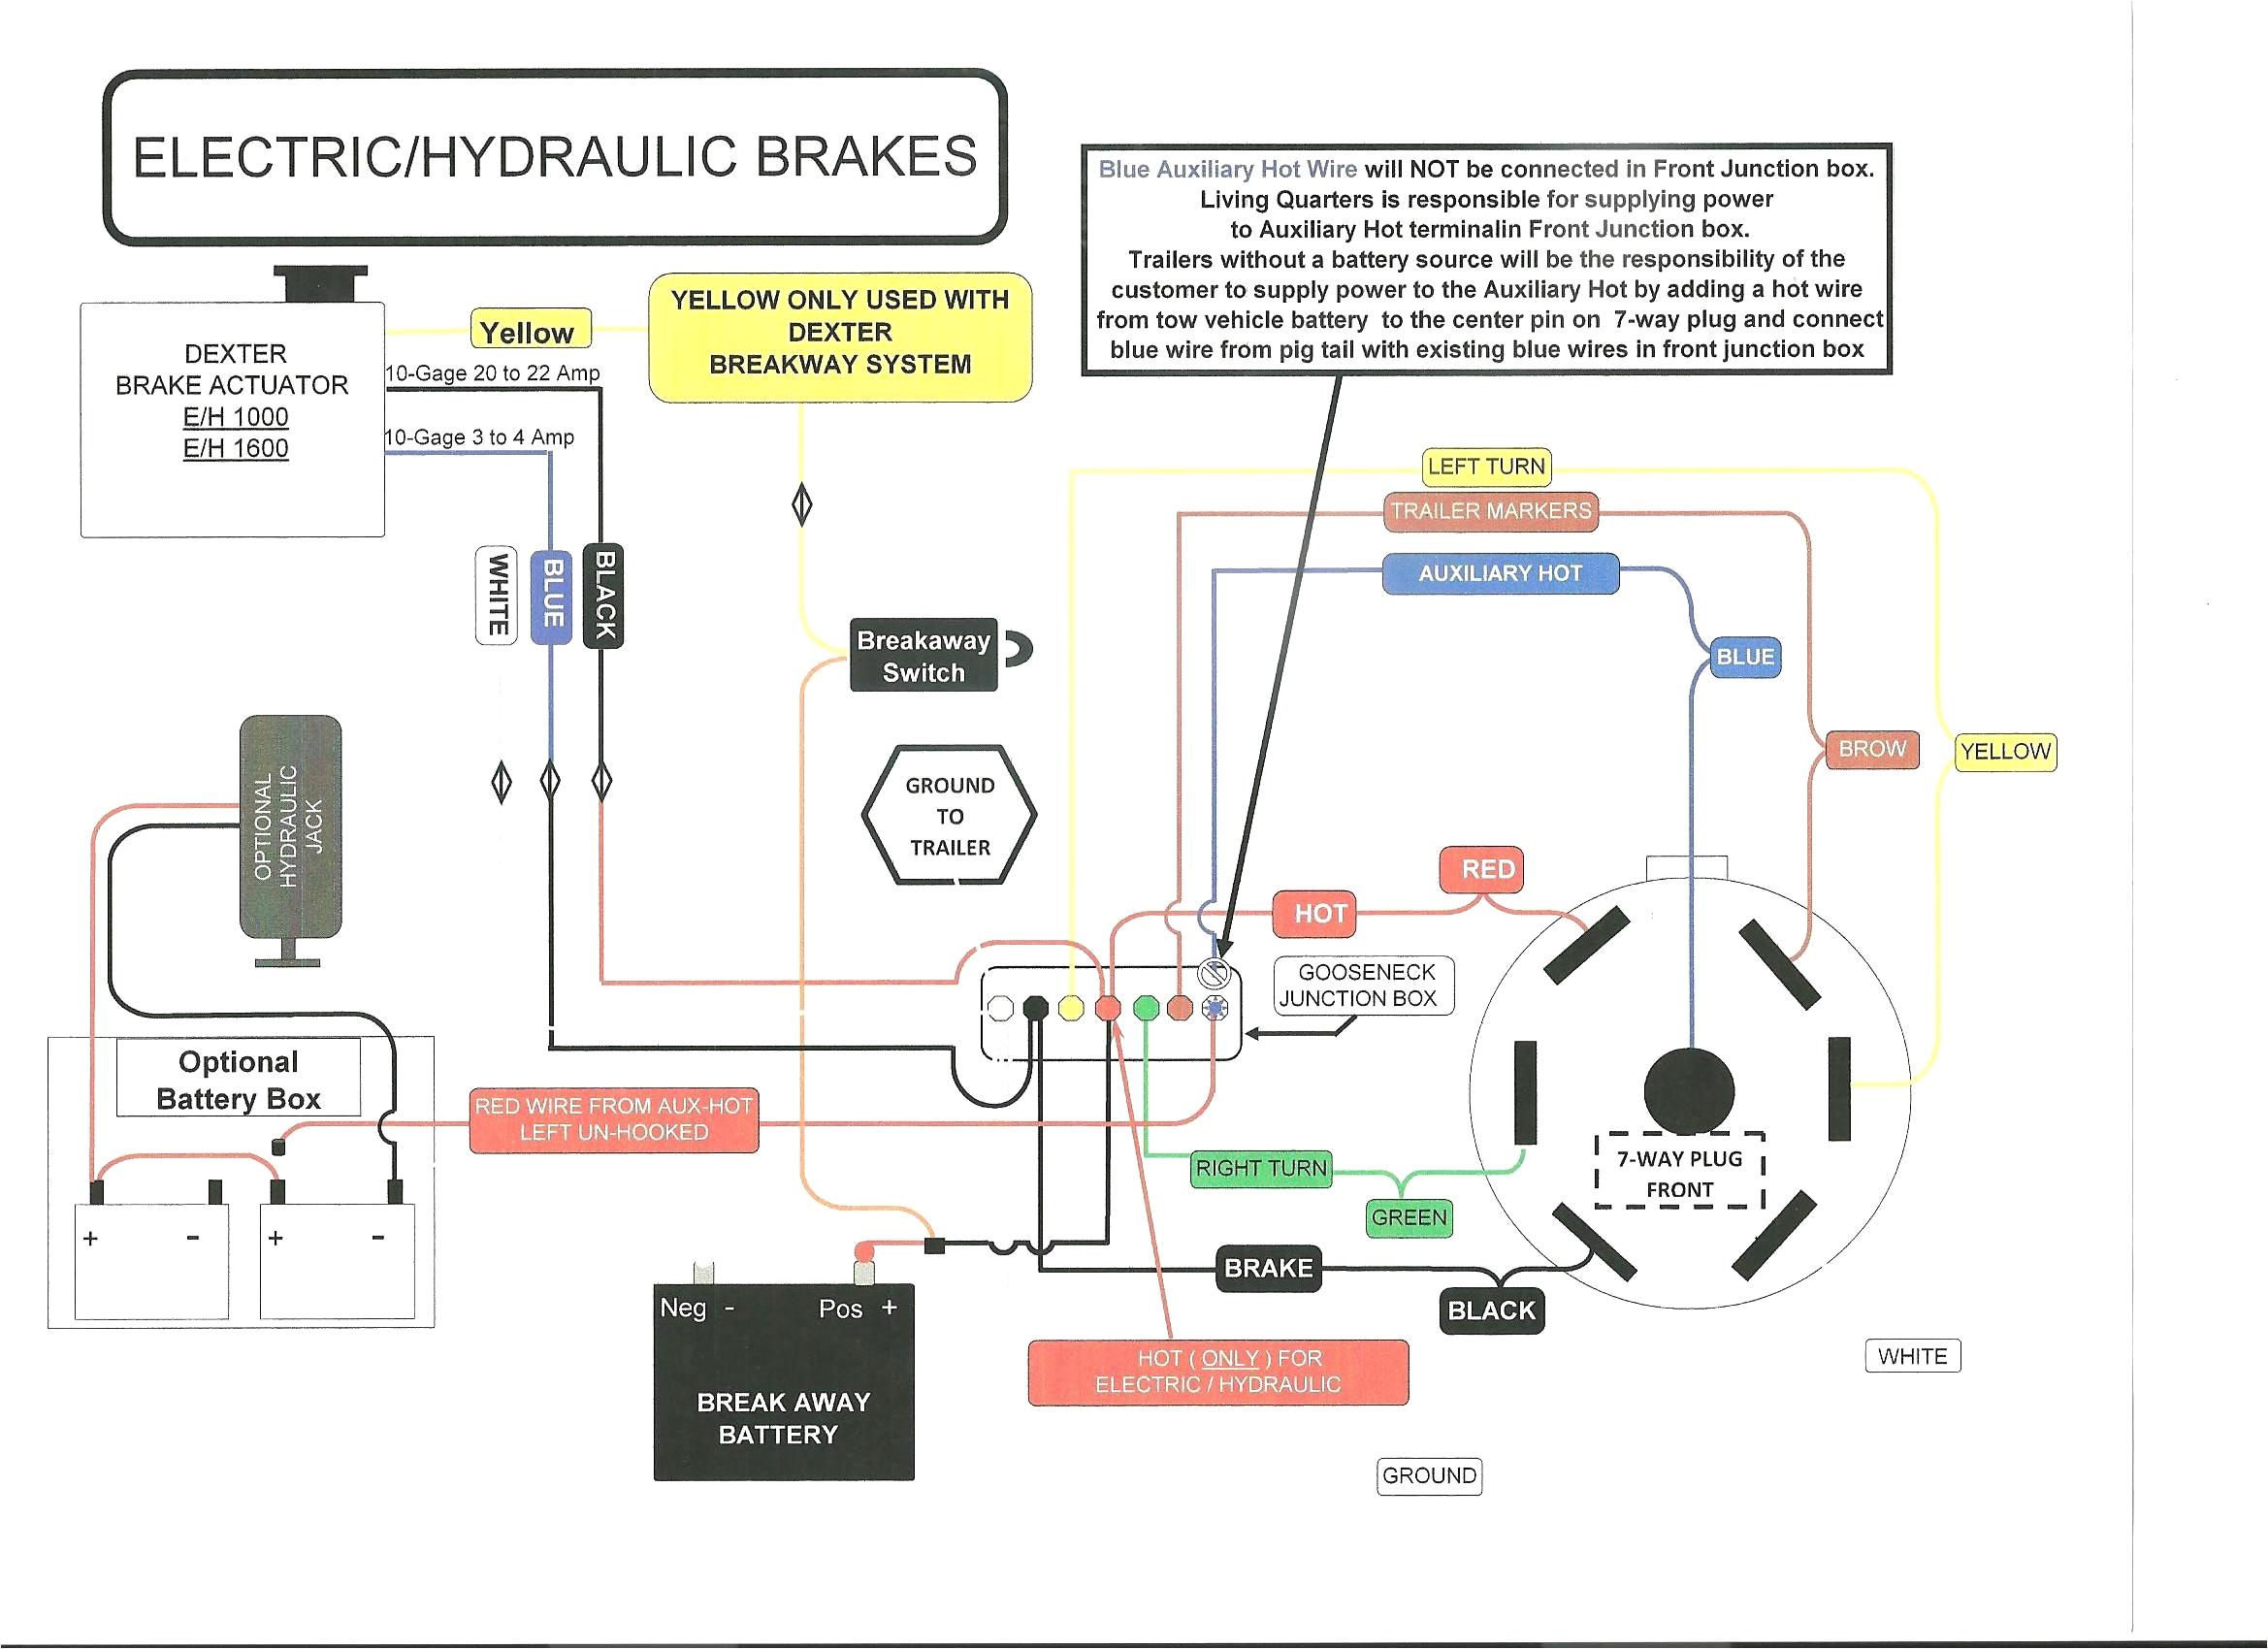 keystone travel trailer wiring diagram wiring diagram show emergencyrepairplumbers com m 2019 07 wiring diagr keystone